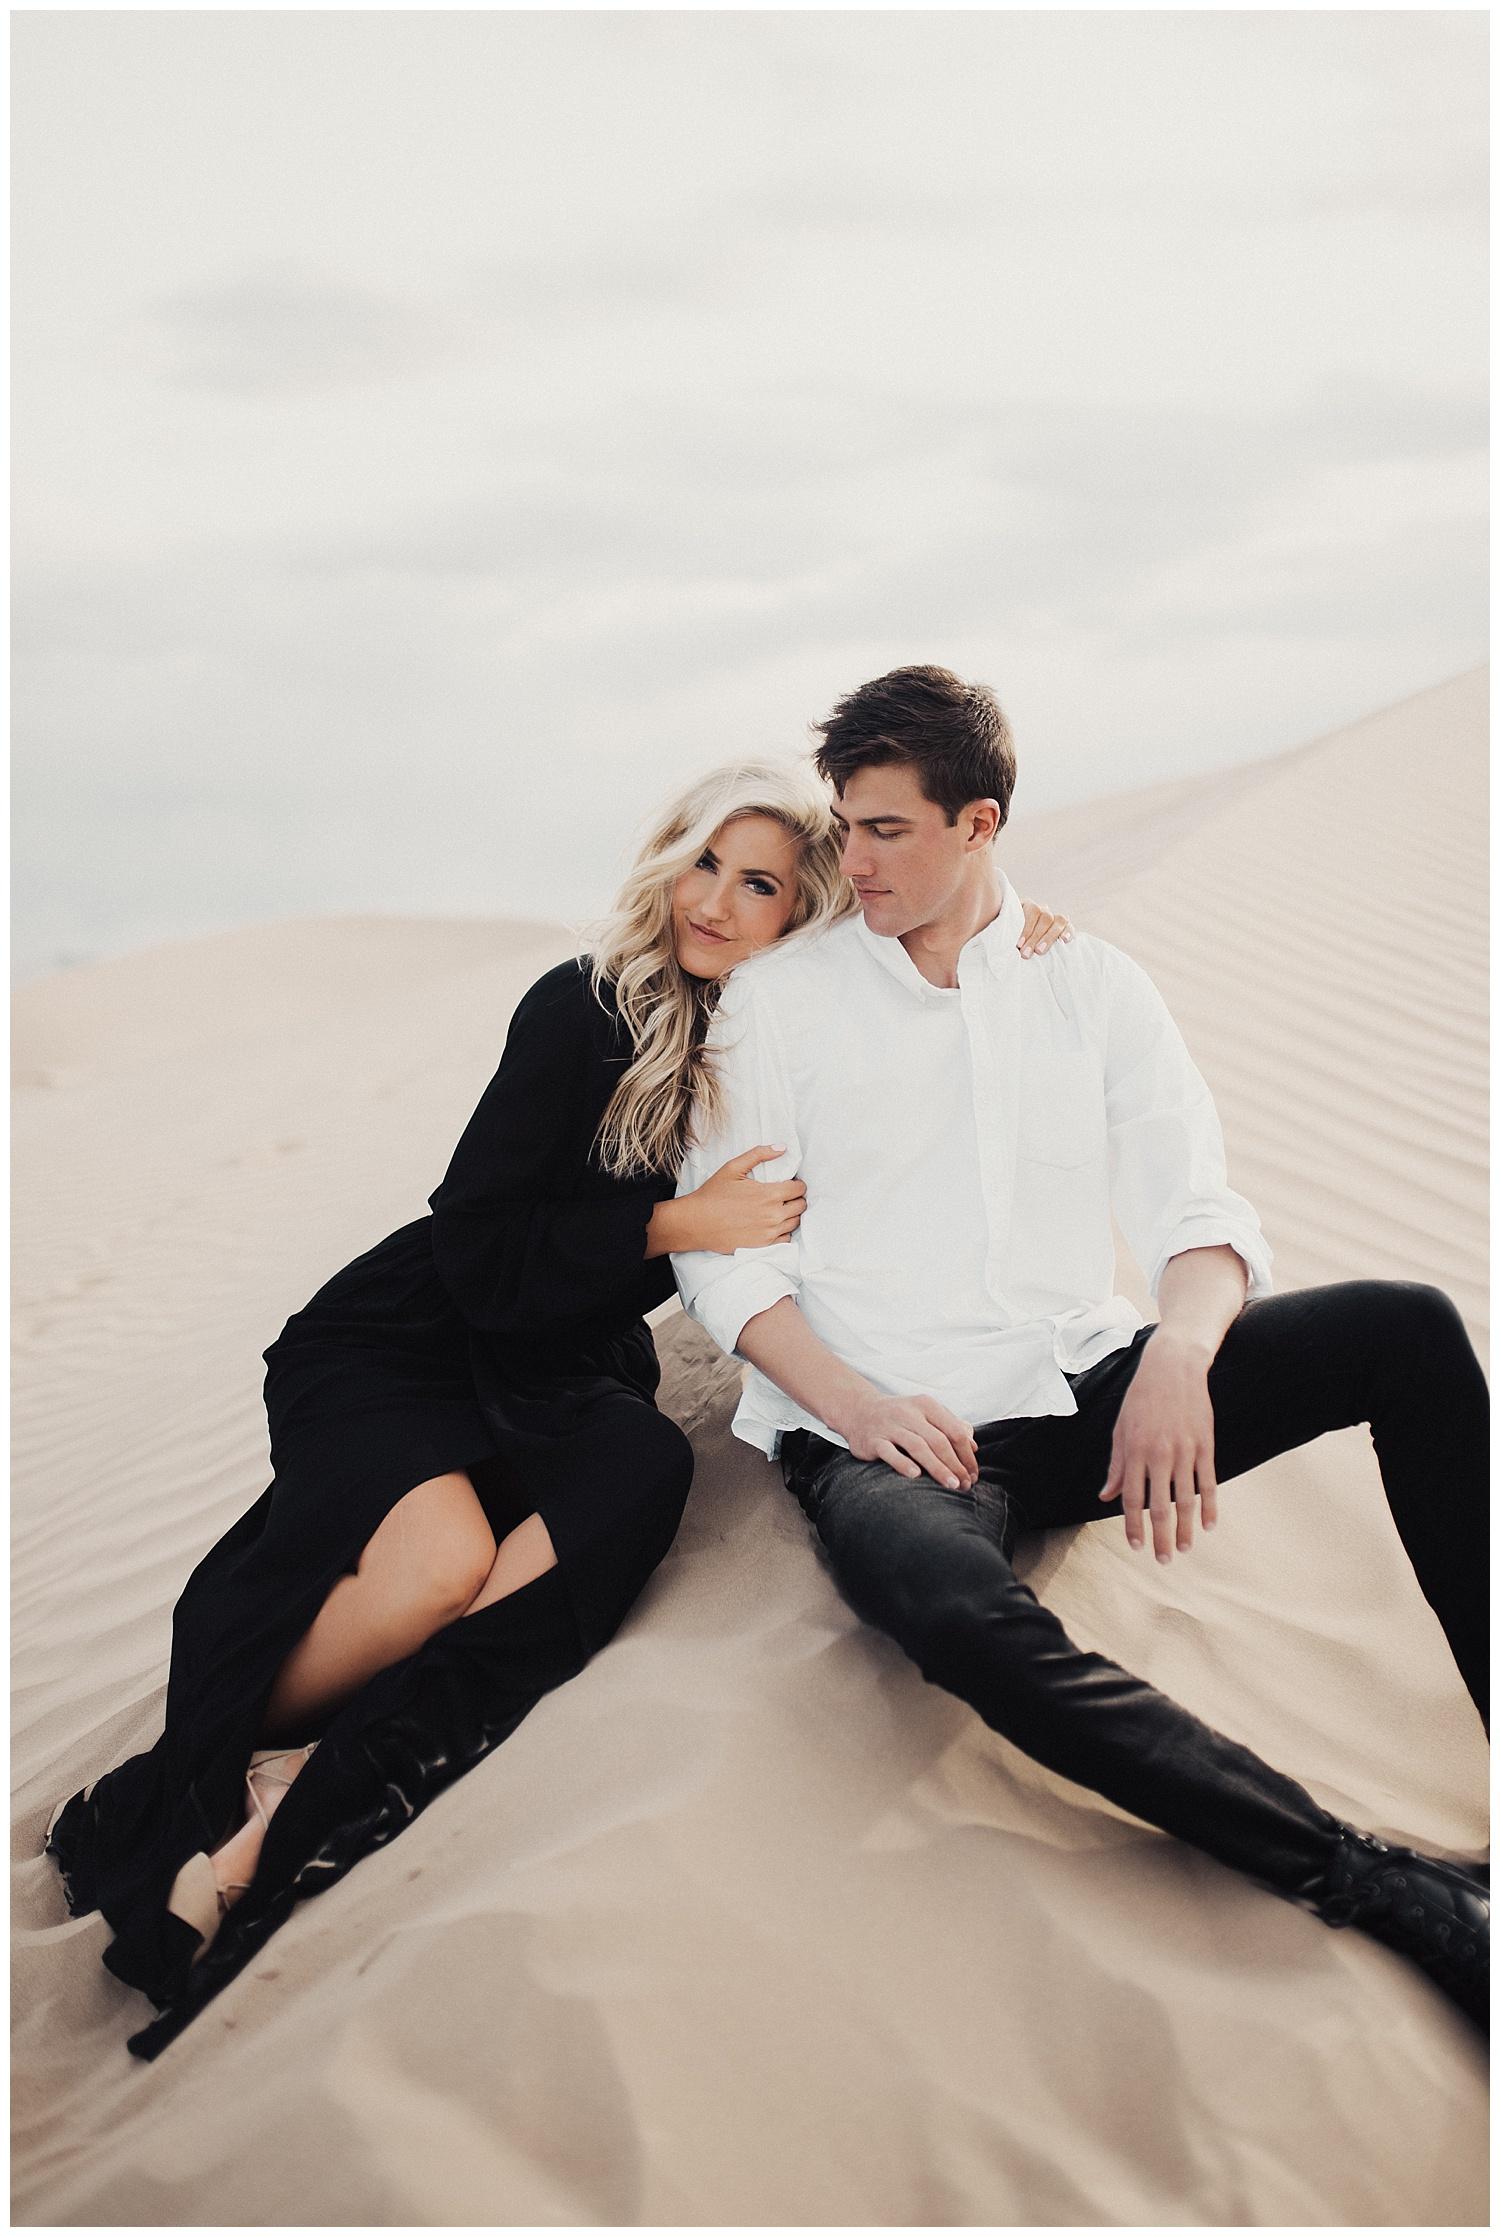 Engagements at Little Sahara Sand Dunes